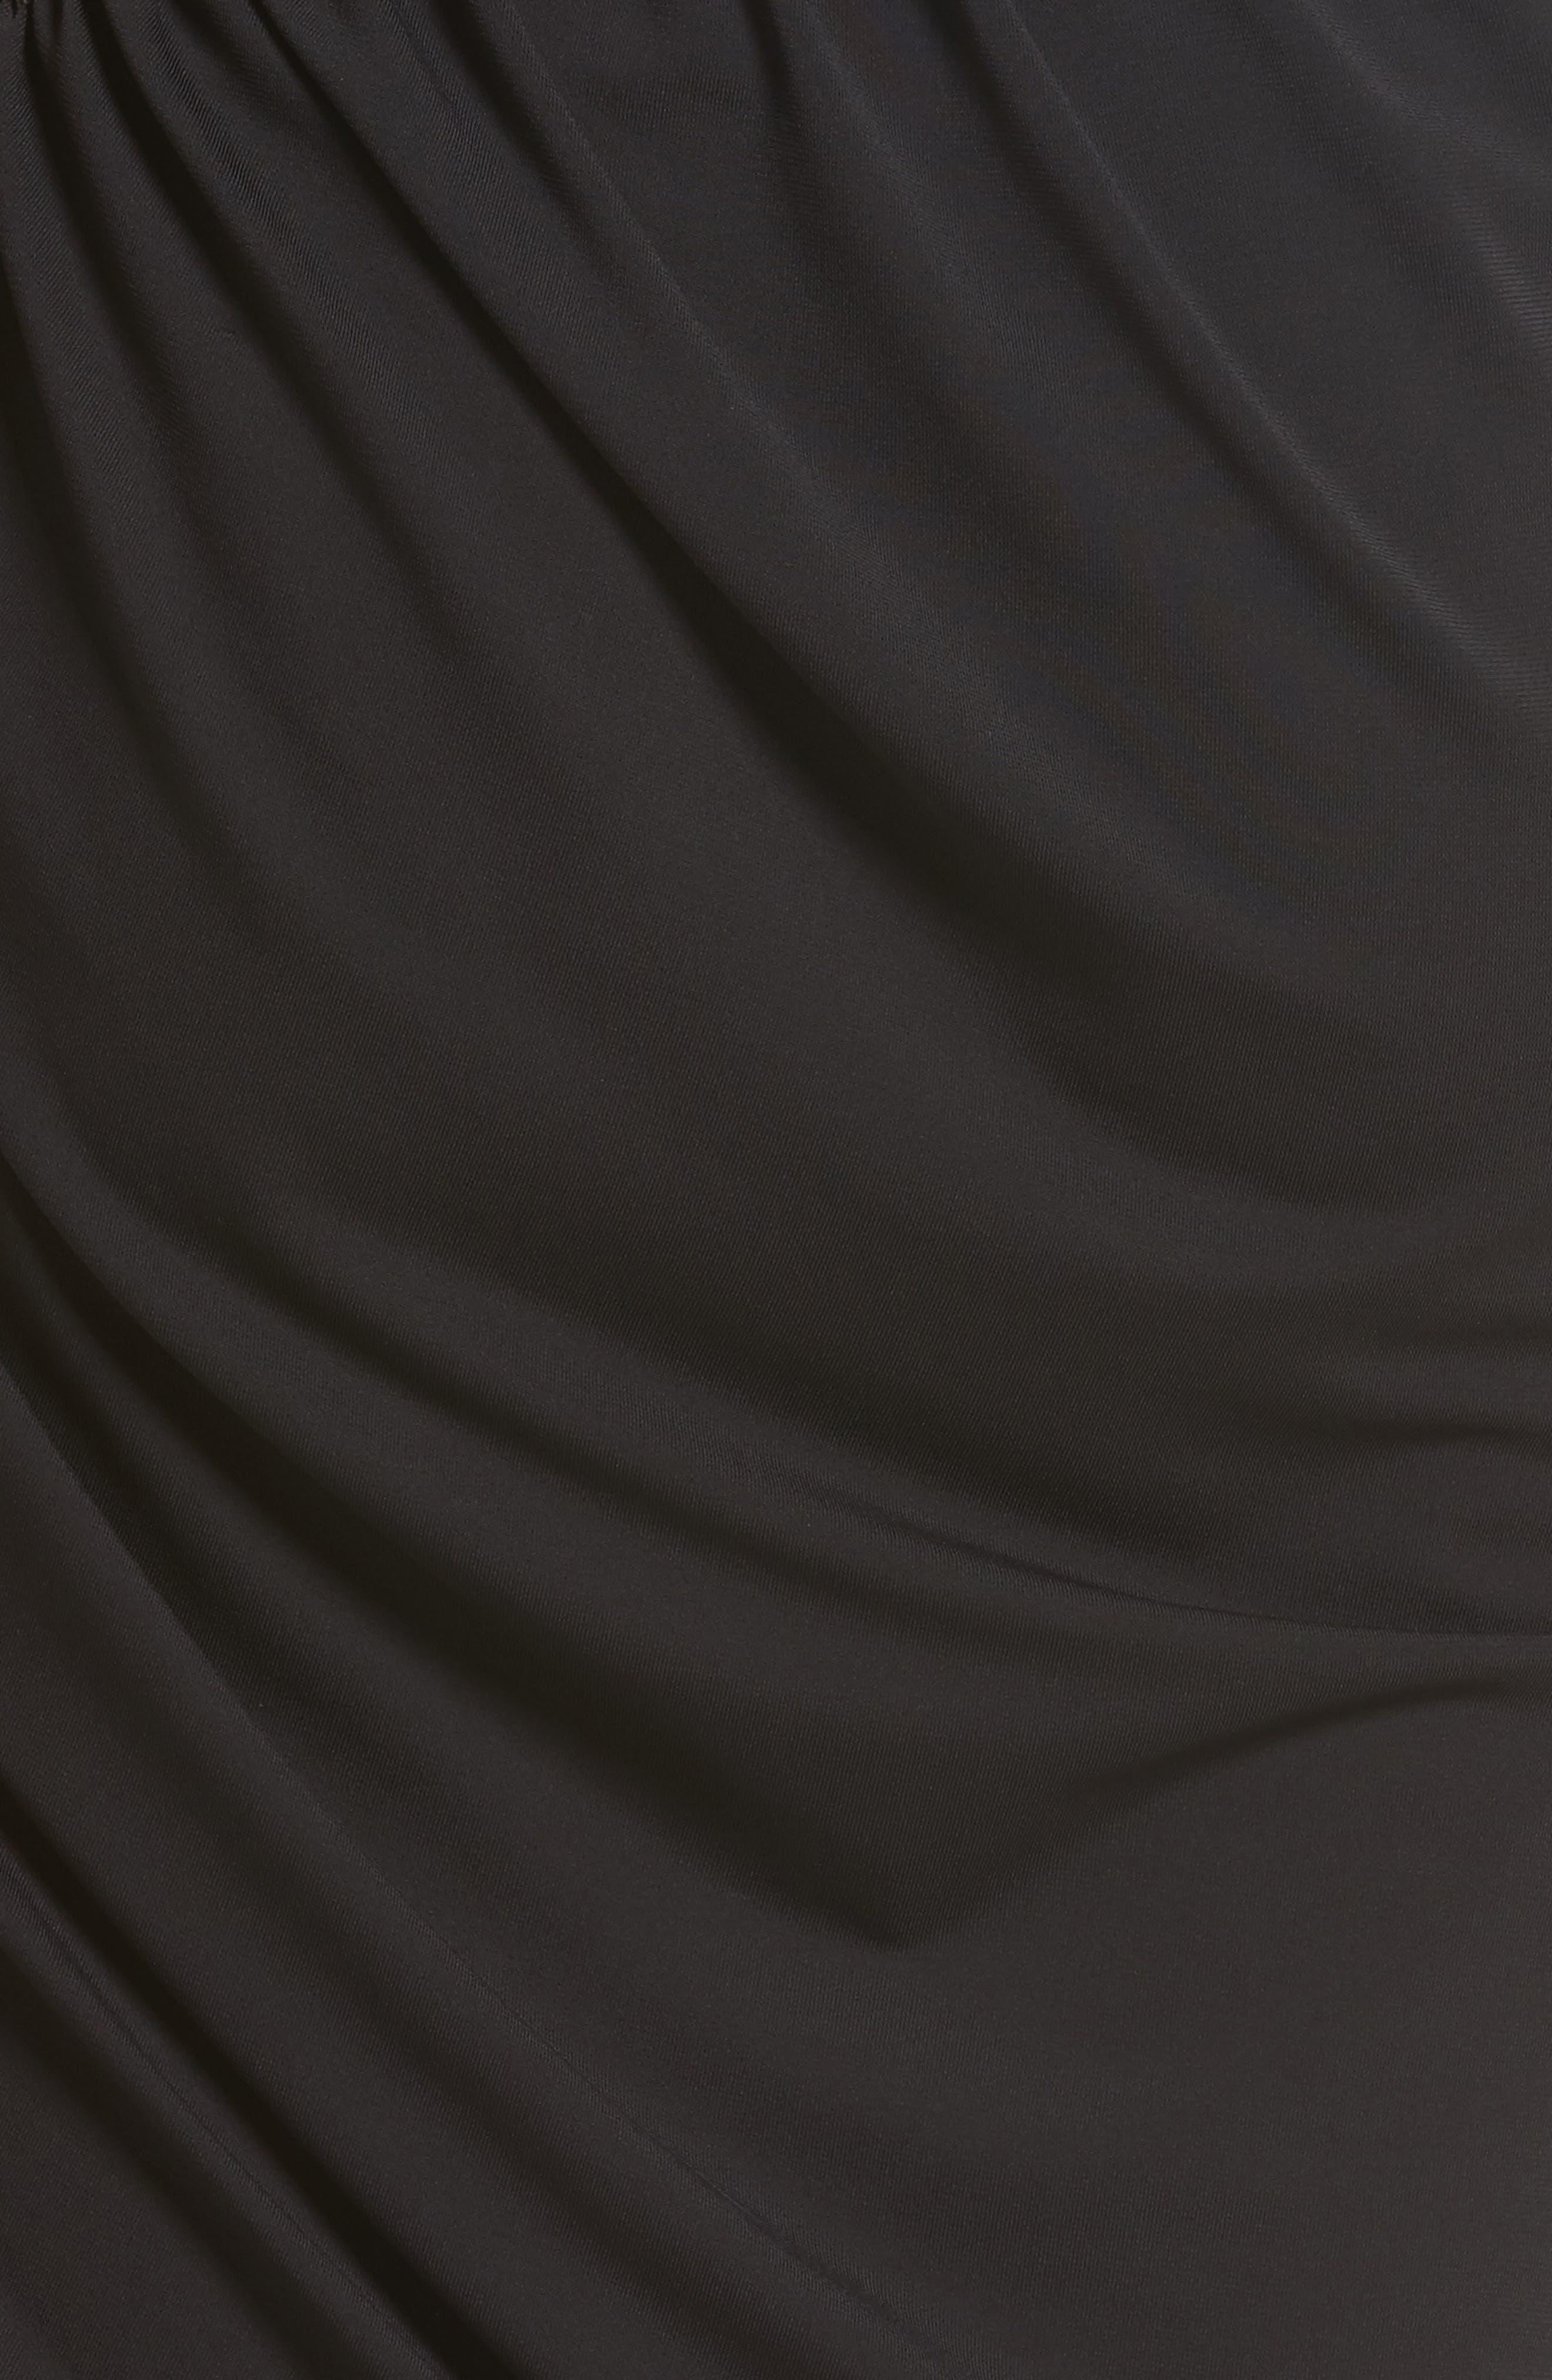 Leather Detail Draped One-Shoulder Dress,                             Alternate thumbnail 5, color,                             001